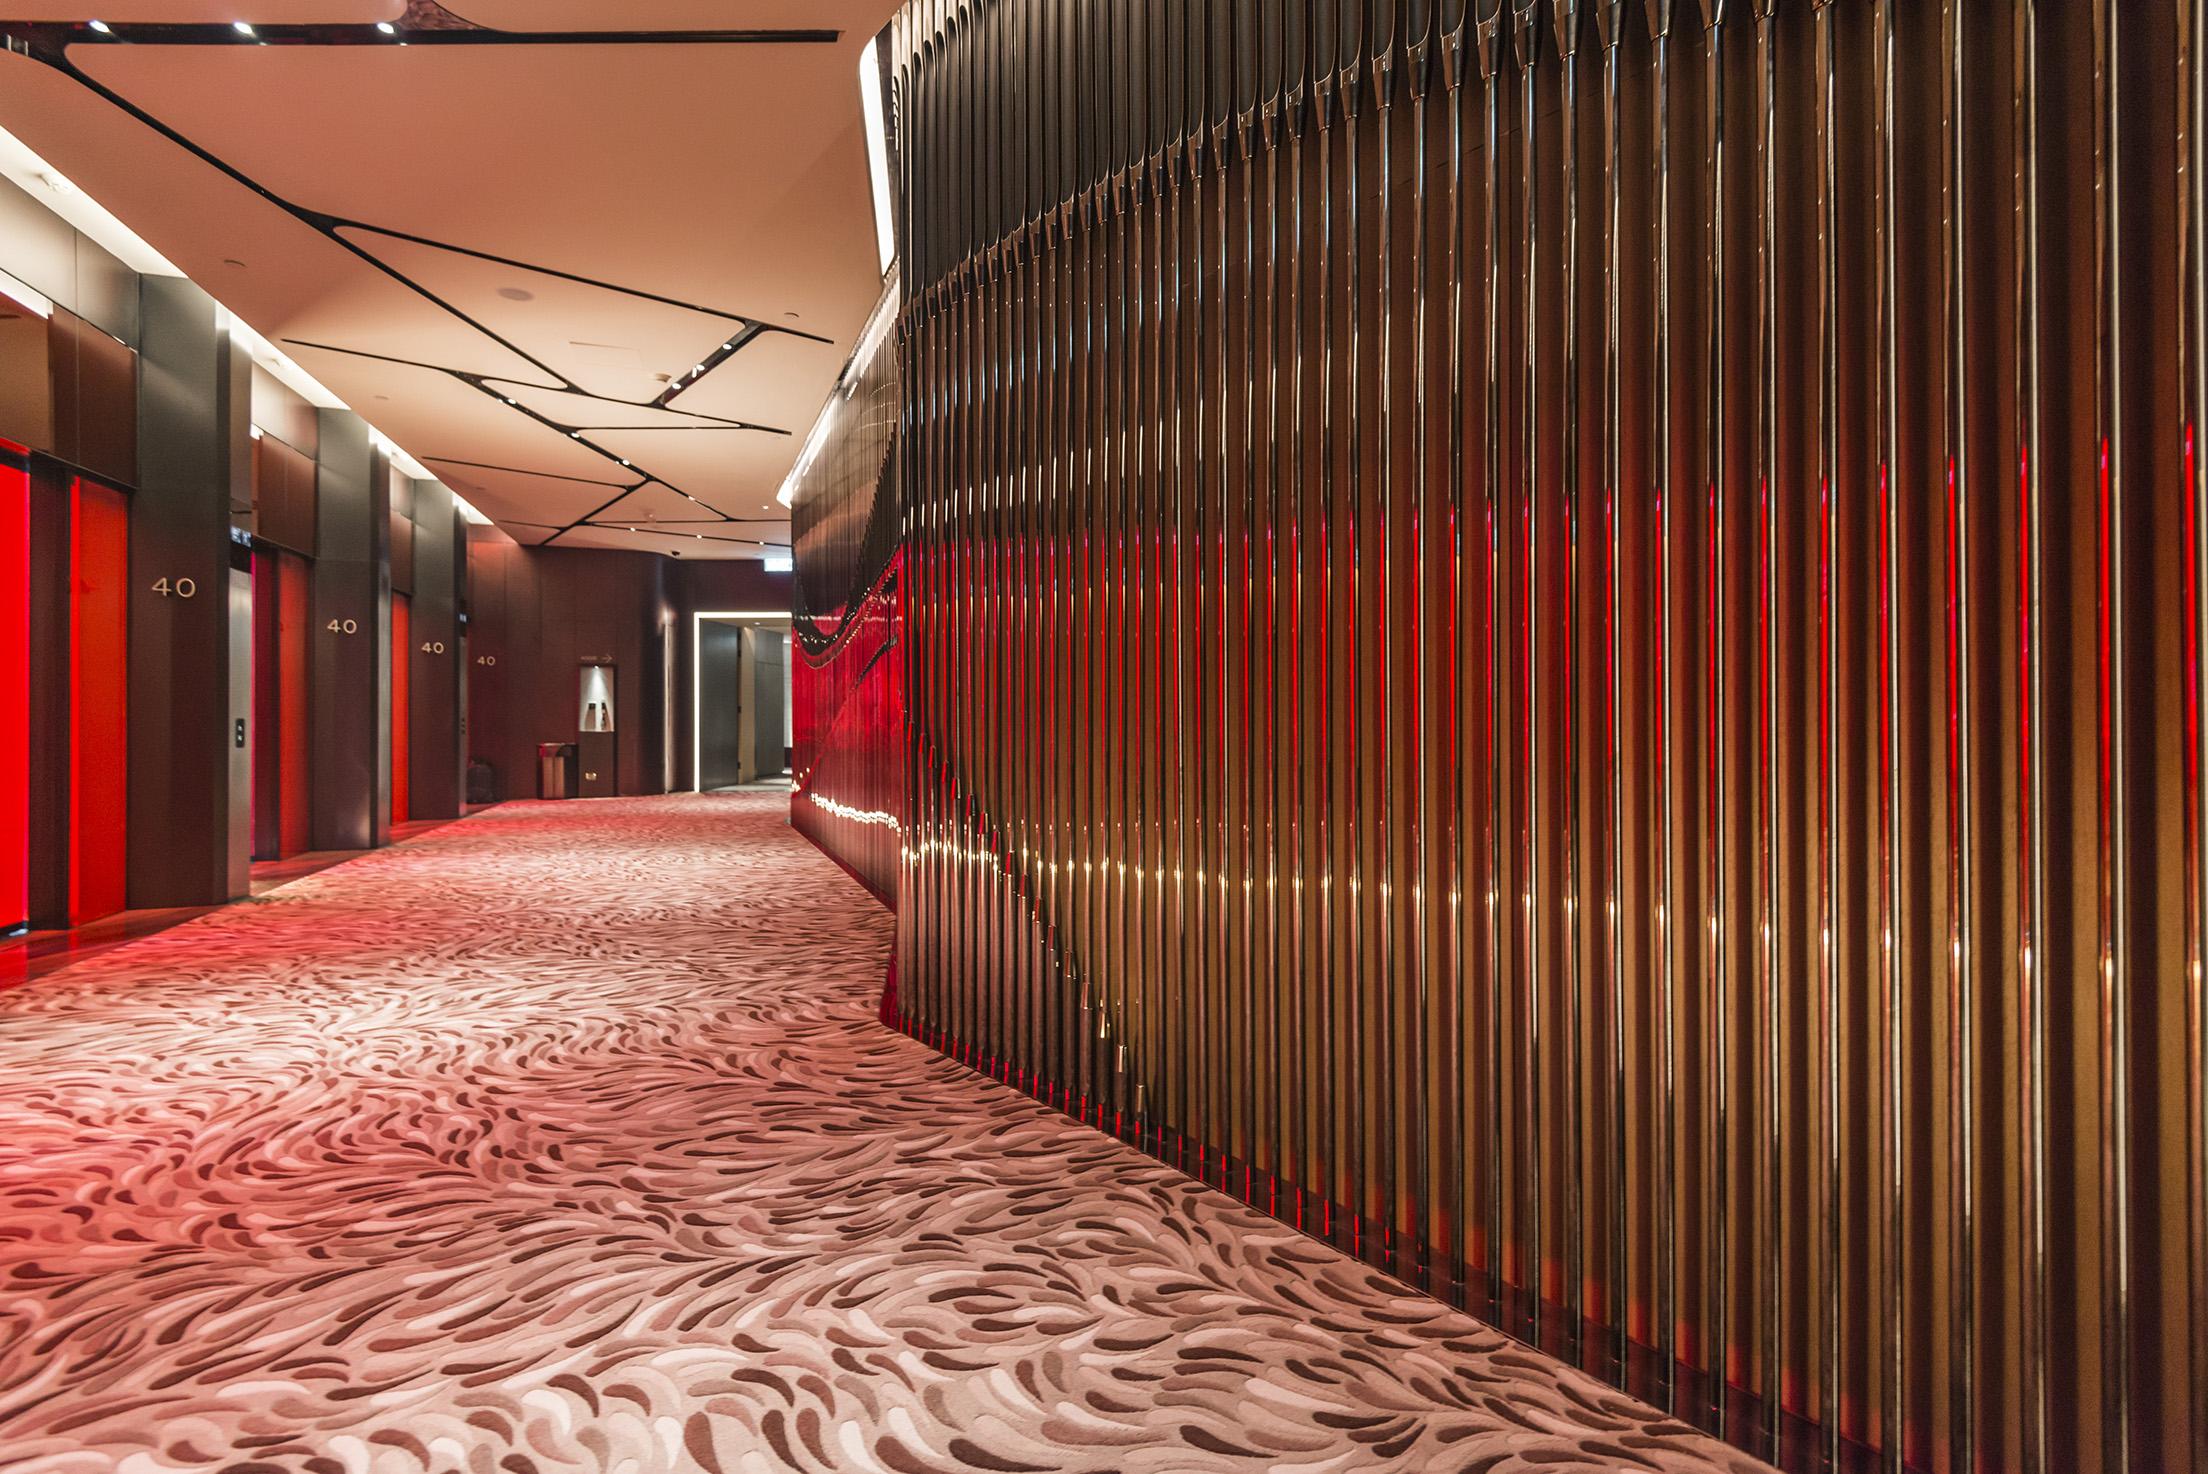 jeb-customprojects-metal-screen-morpheus-hotel-macau-04.jpg